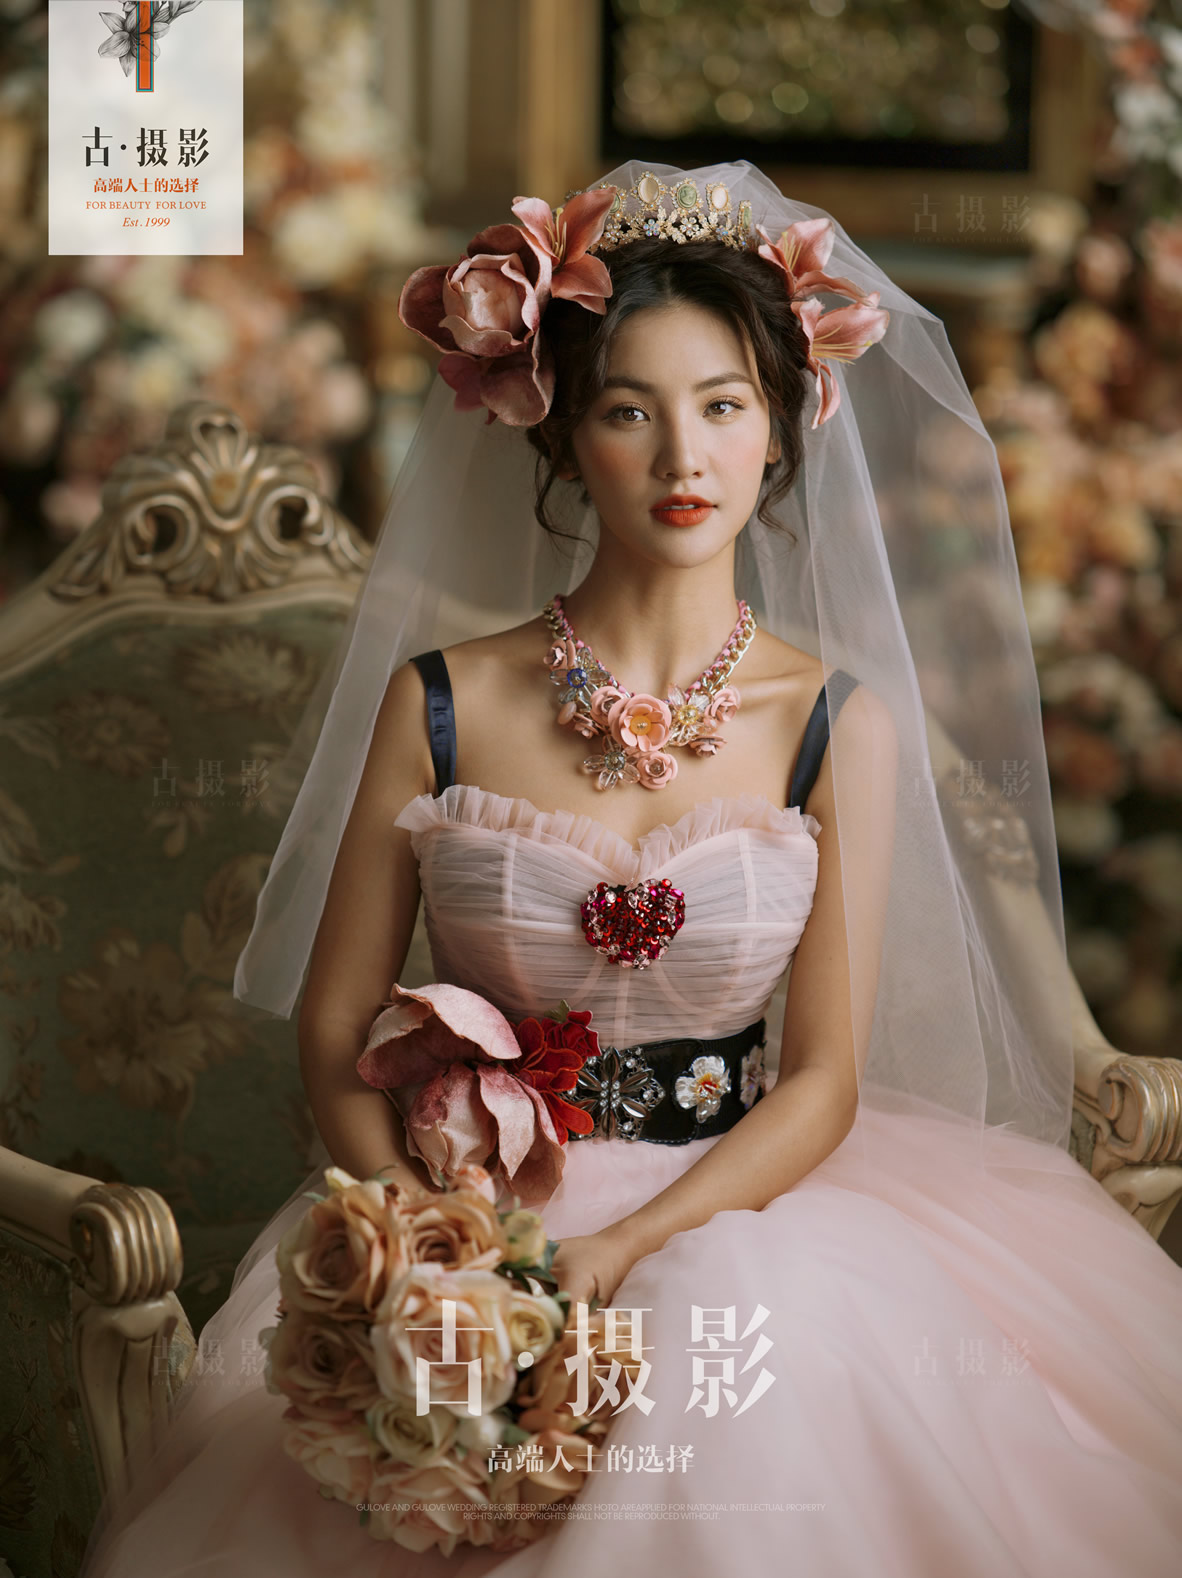 GRACE - 明星范 - 武汉古摄影-武汉婚纱摄影艺术摄影网